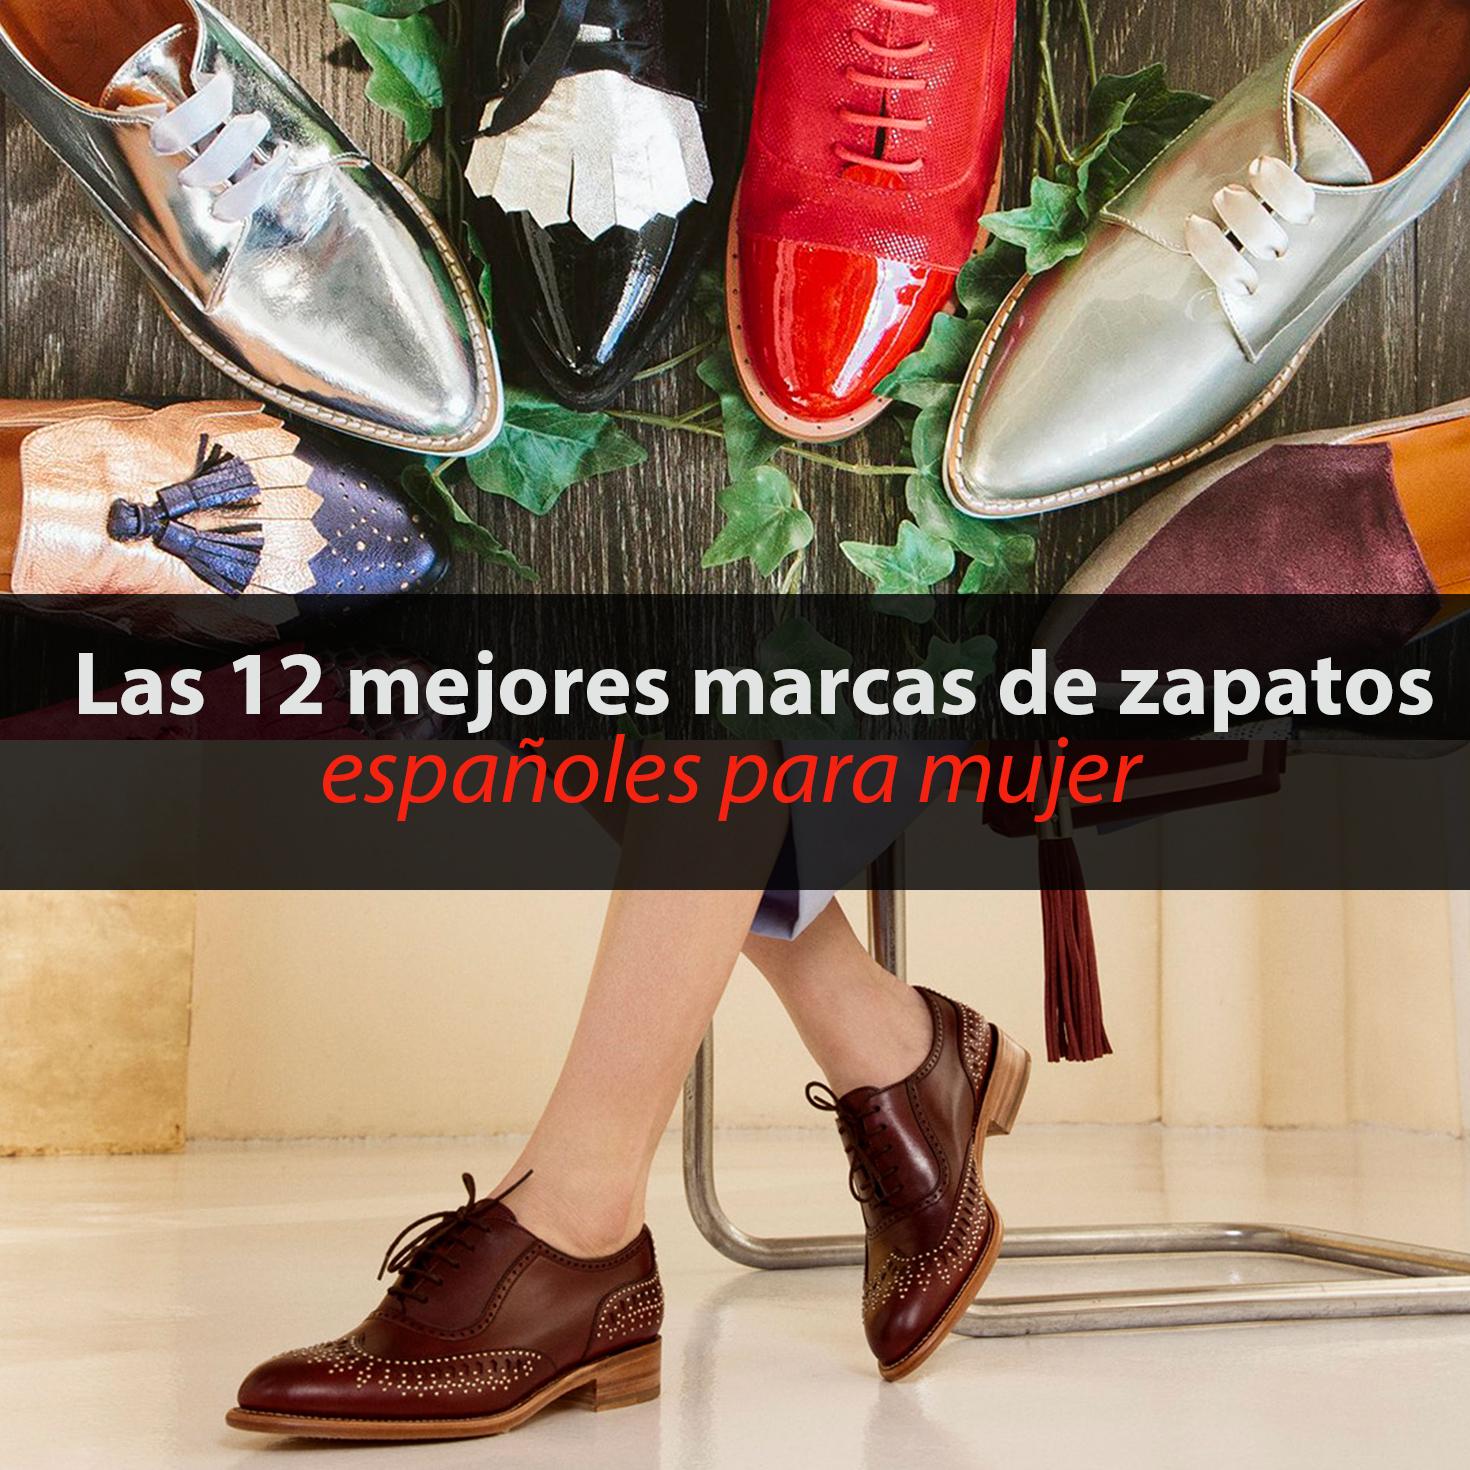 Españoles Mejores Marcas Chicas Para De Métodos 12 Las Zapatos xqX5A7E